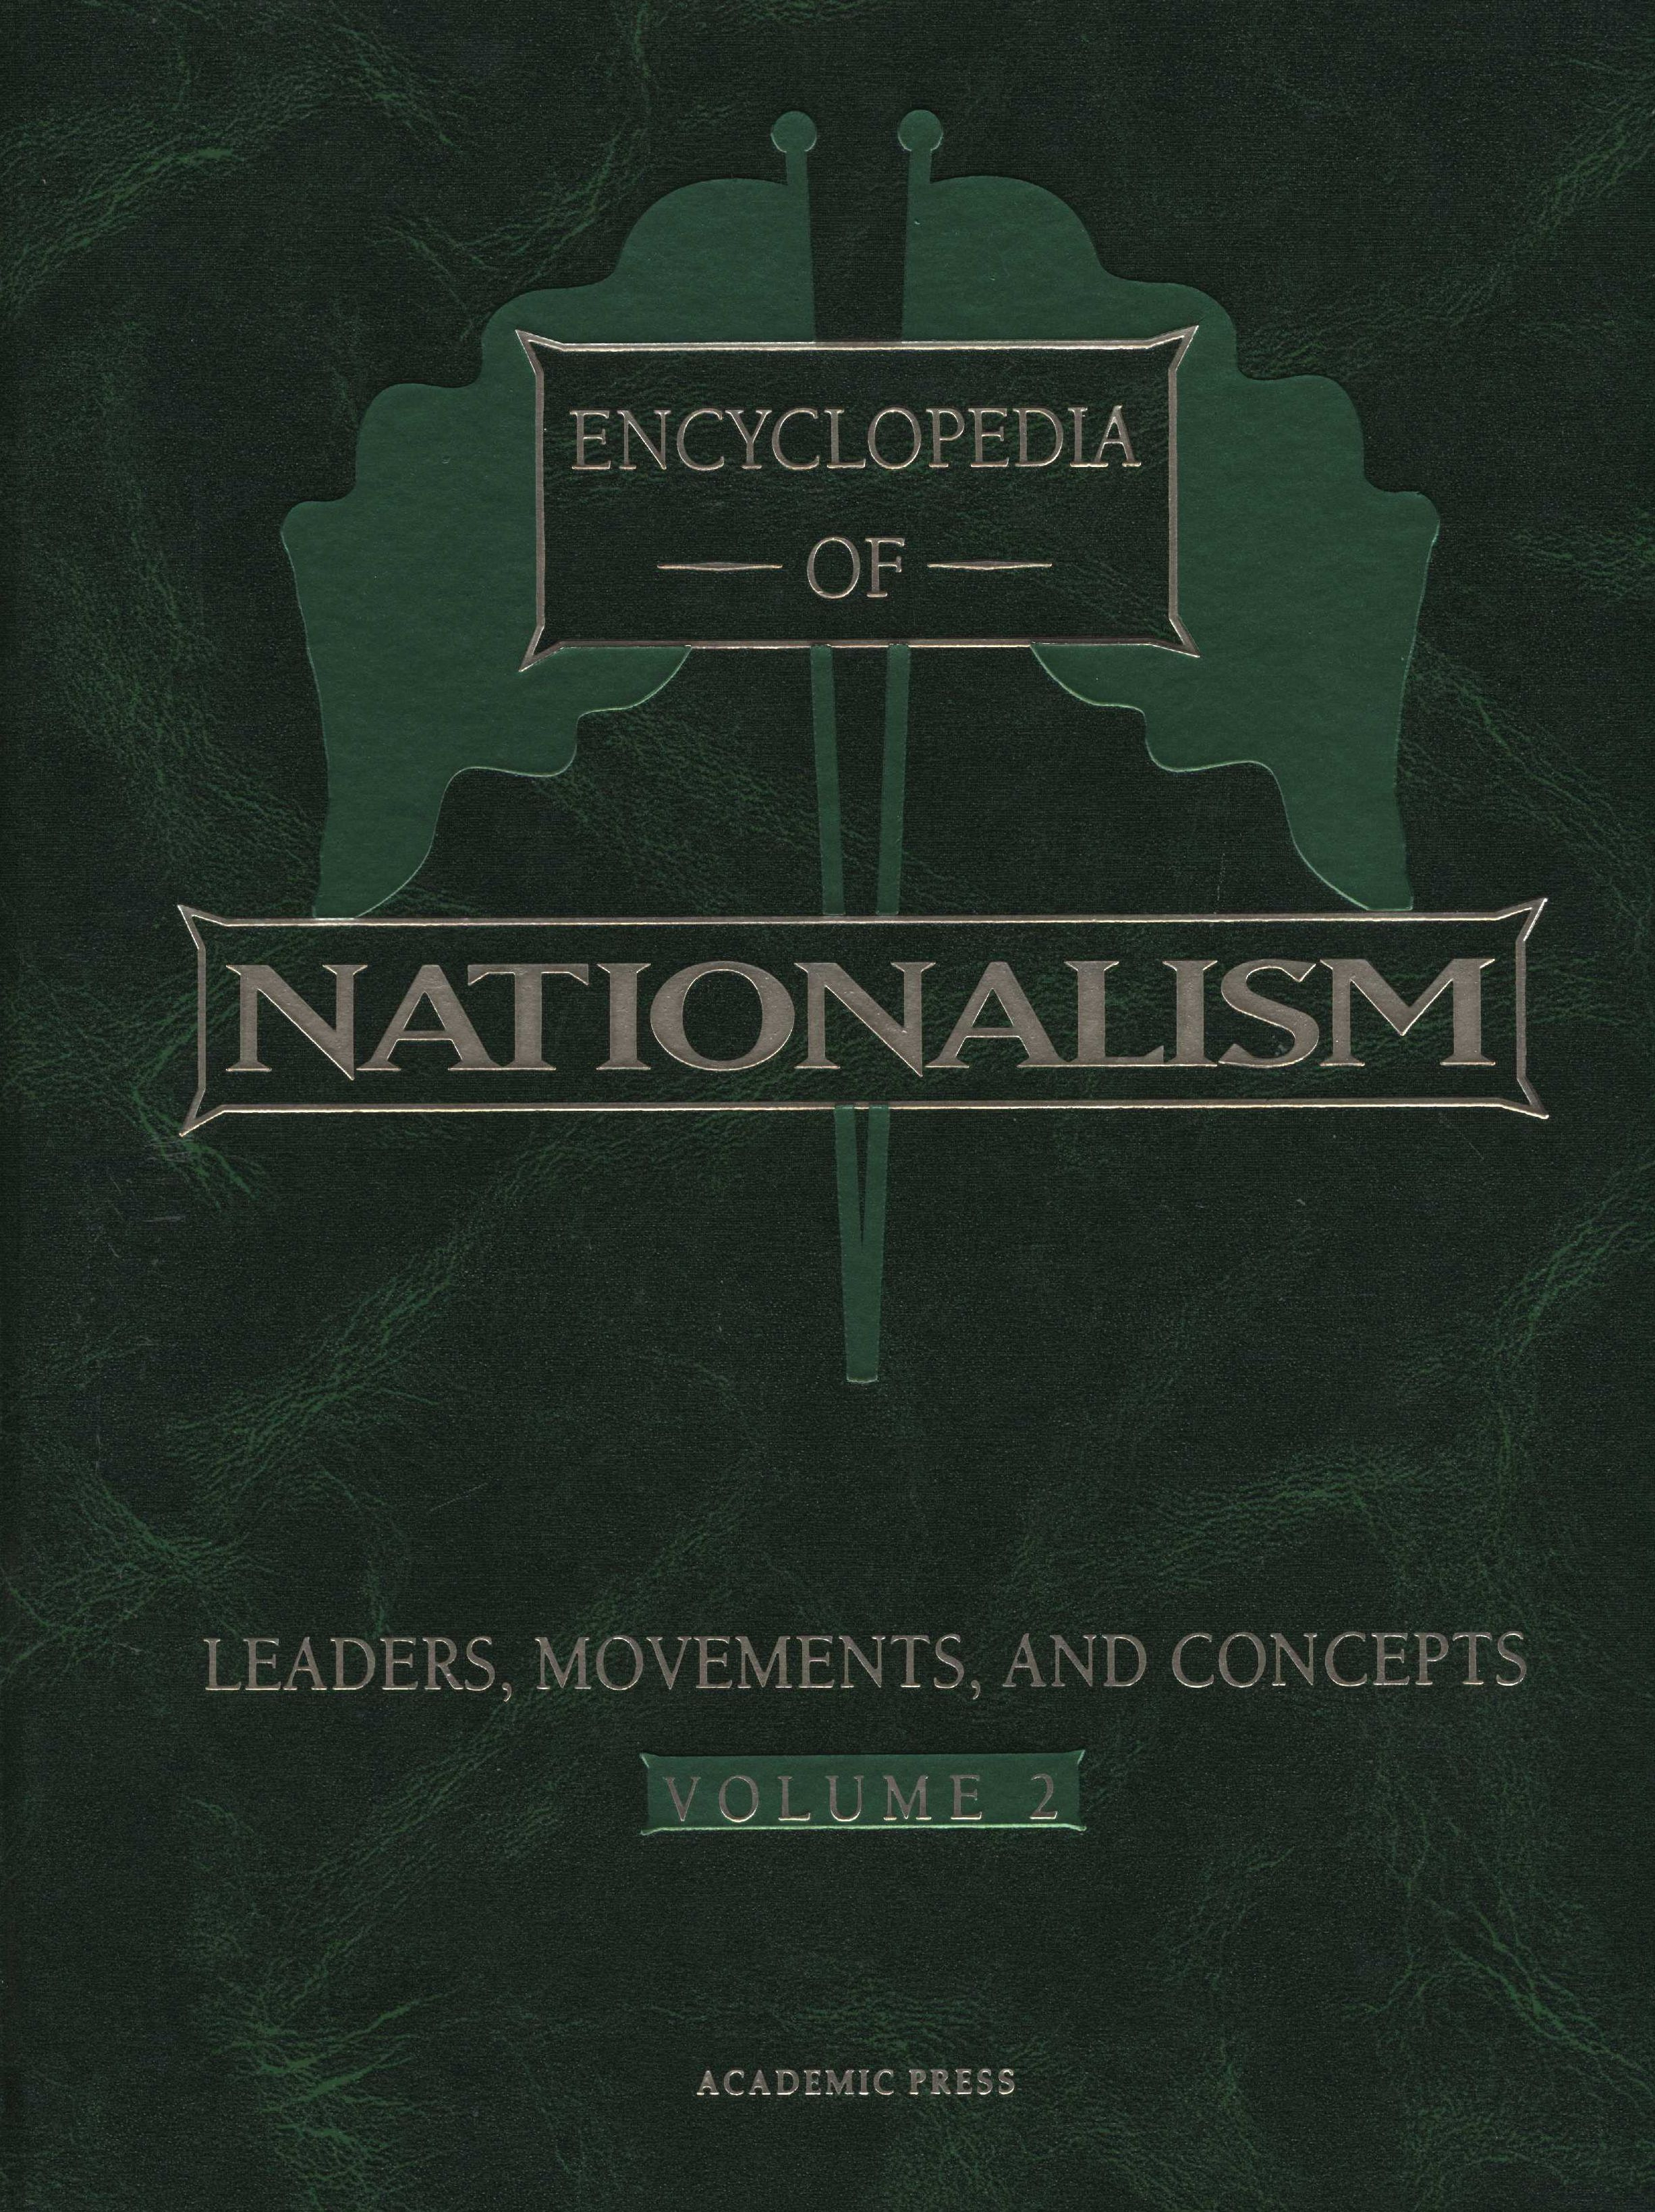 Encyclopedia of Nationalism